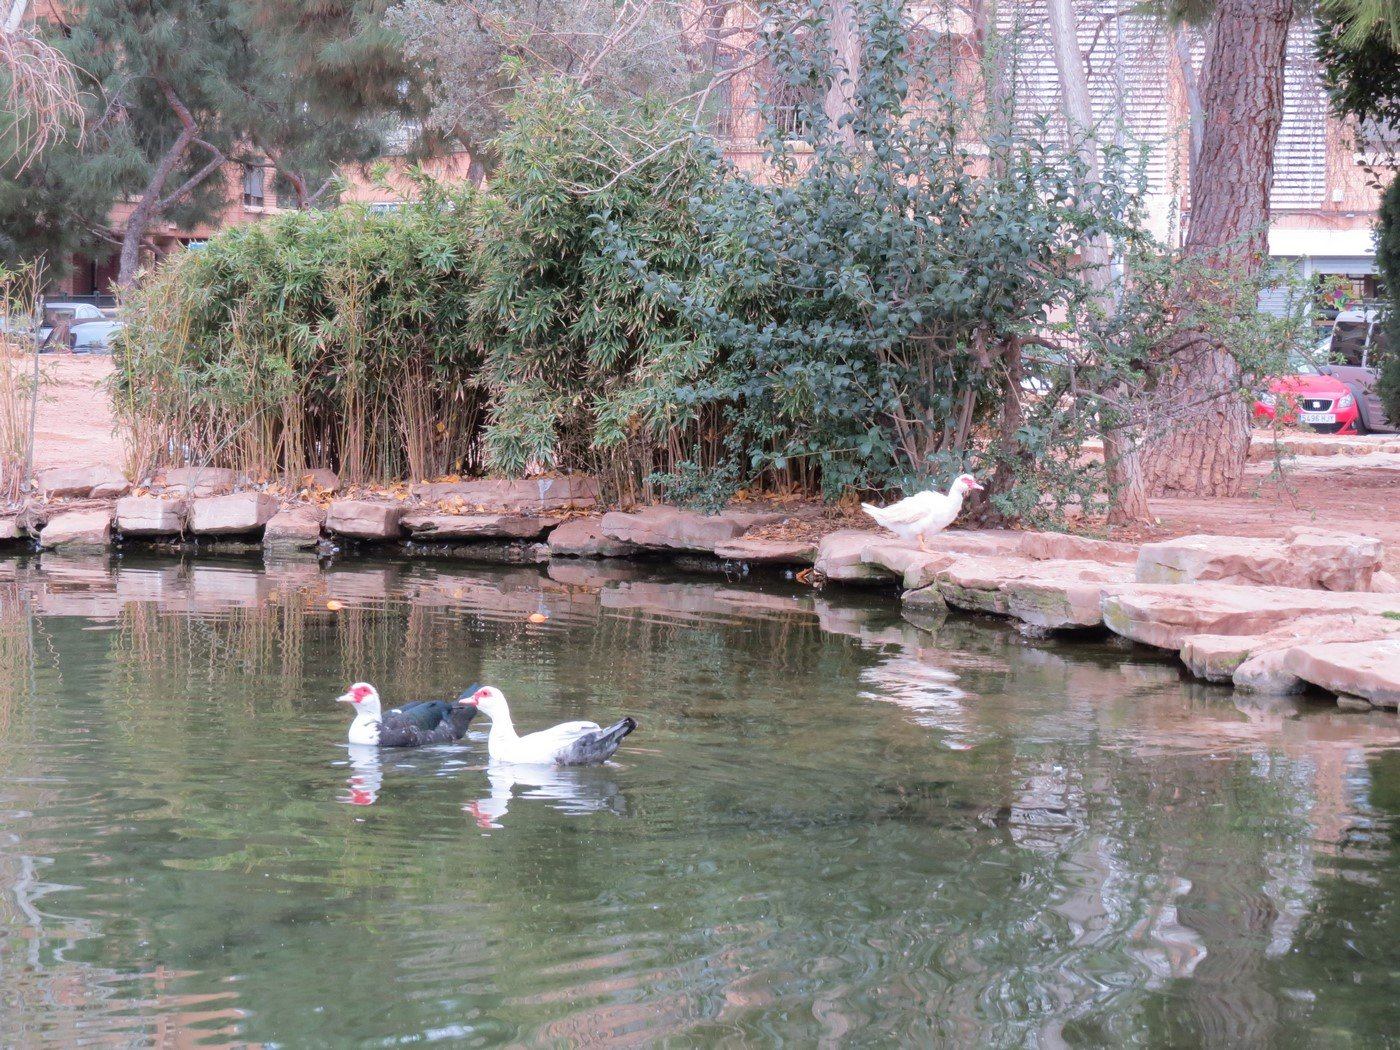 lago con animales